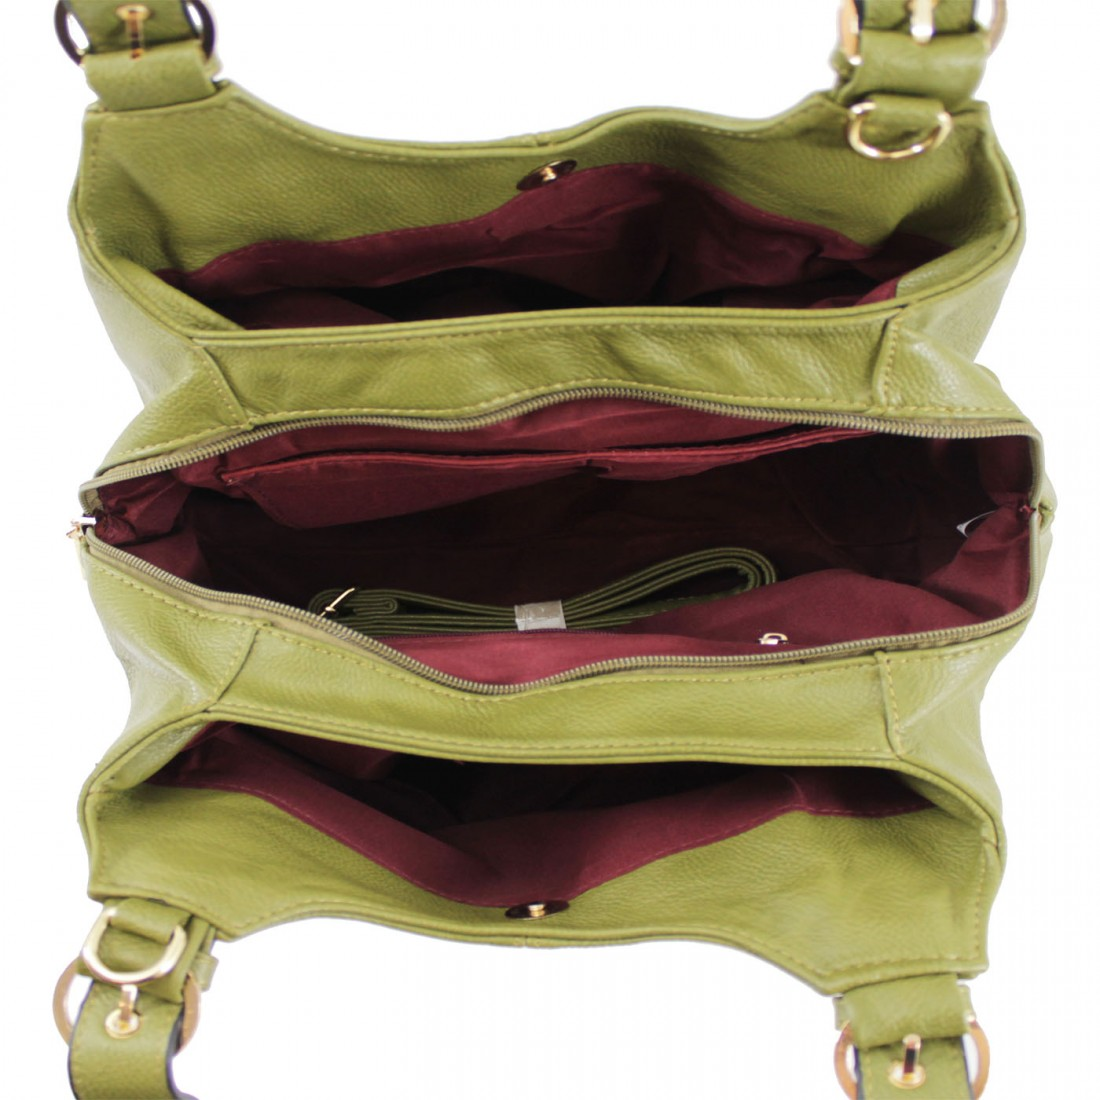 3 Section Buckle Shoulder Bag - Various Colours